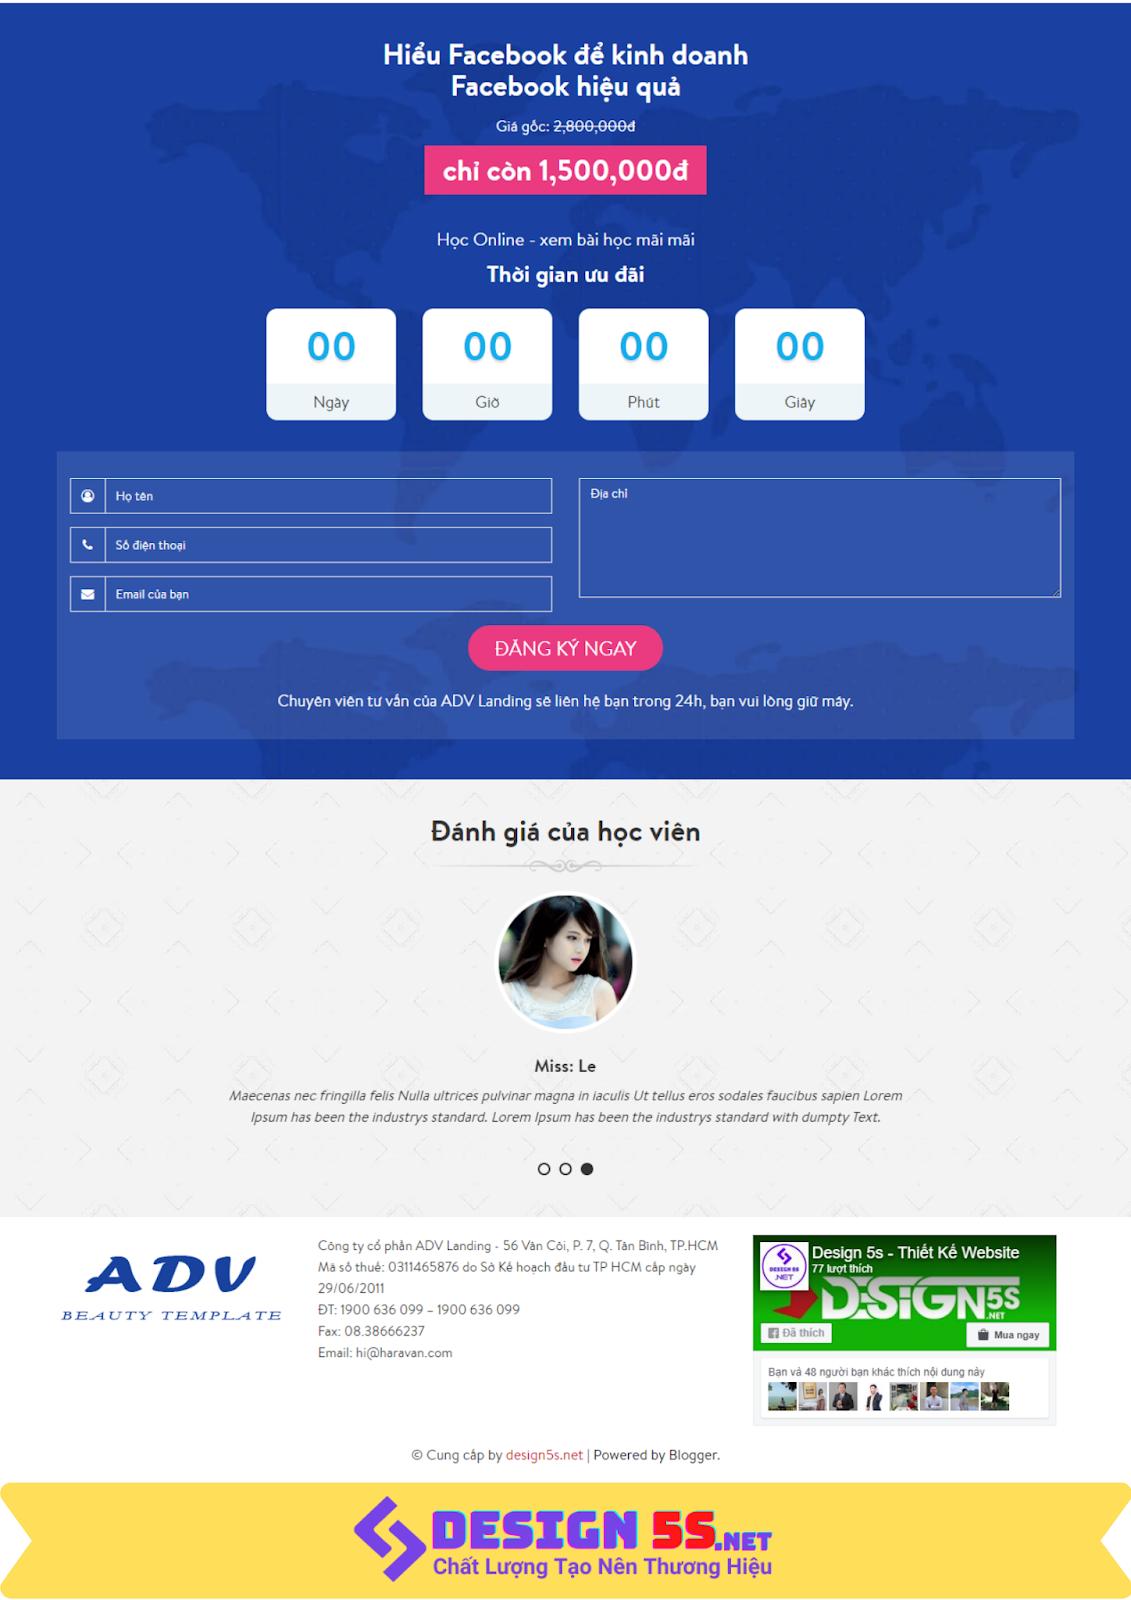 Theme blogspot landing page dịch vụ cho Facebook VSM50 - Ảnh 2